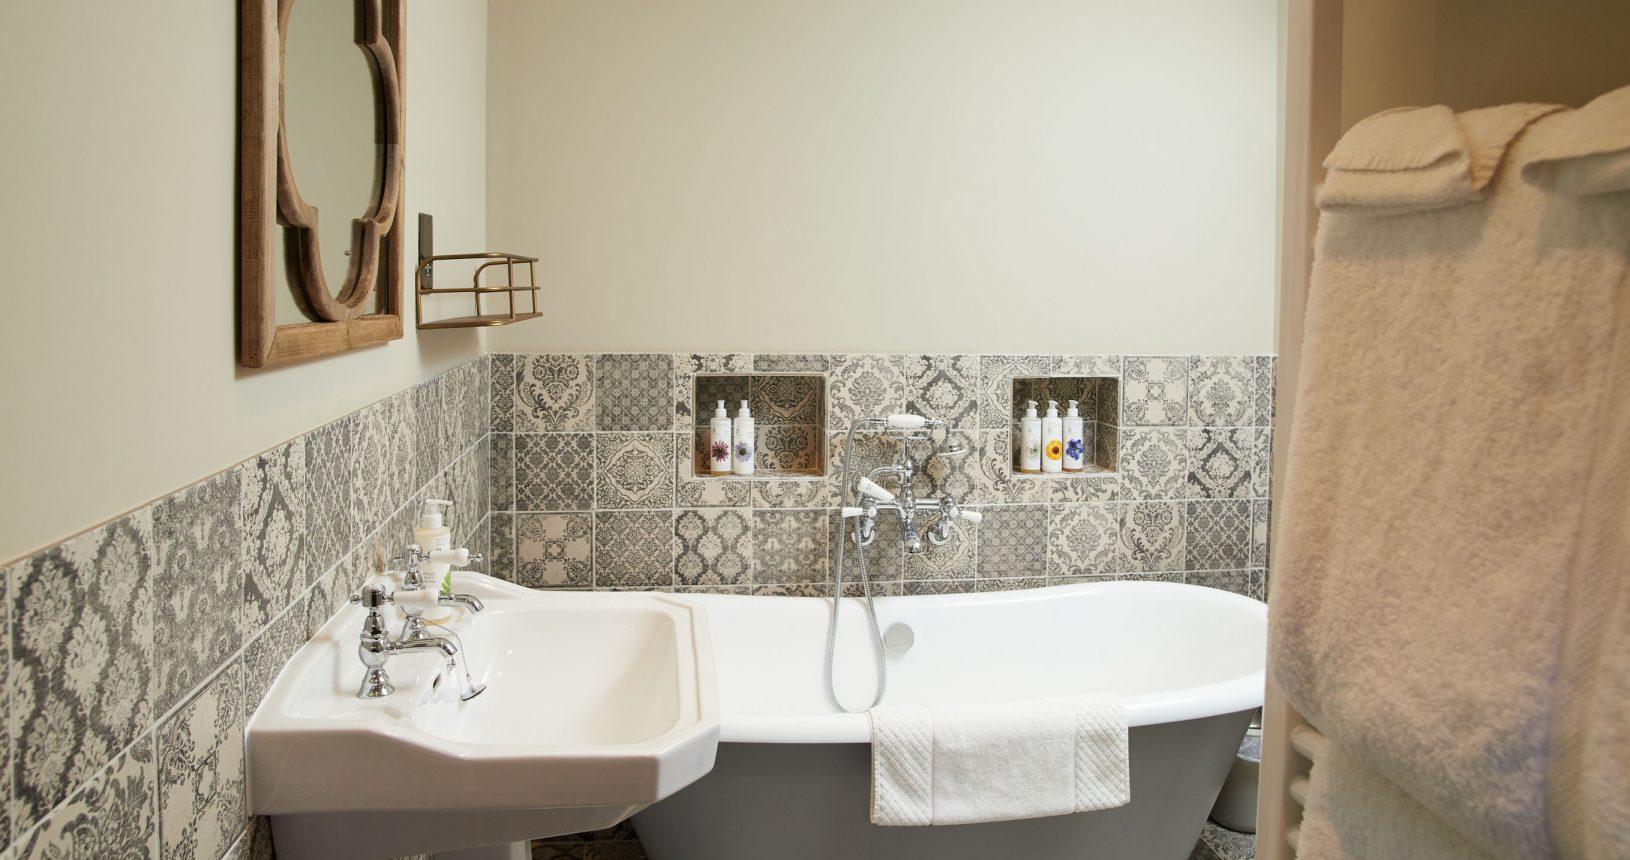 Kilpatrick tiled bathroom at Annas Hotel Norfolk Coast